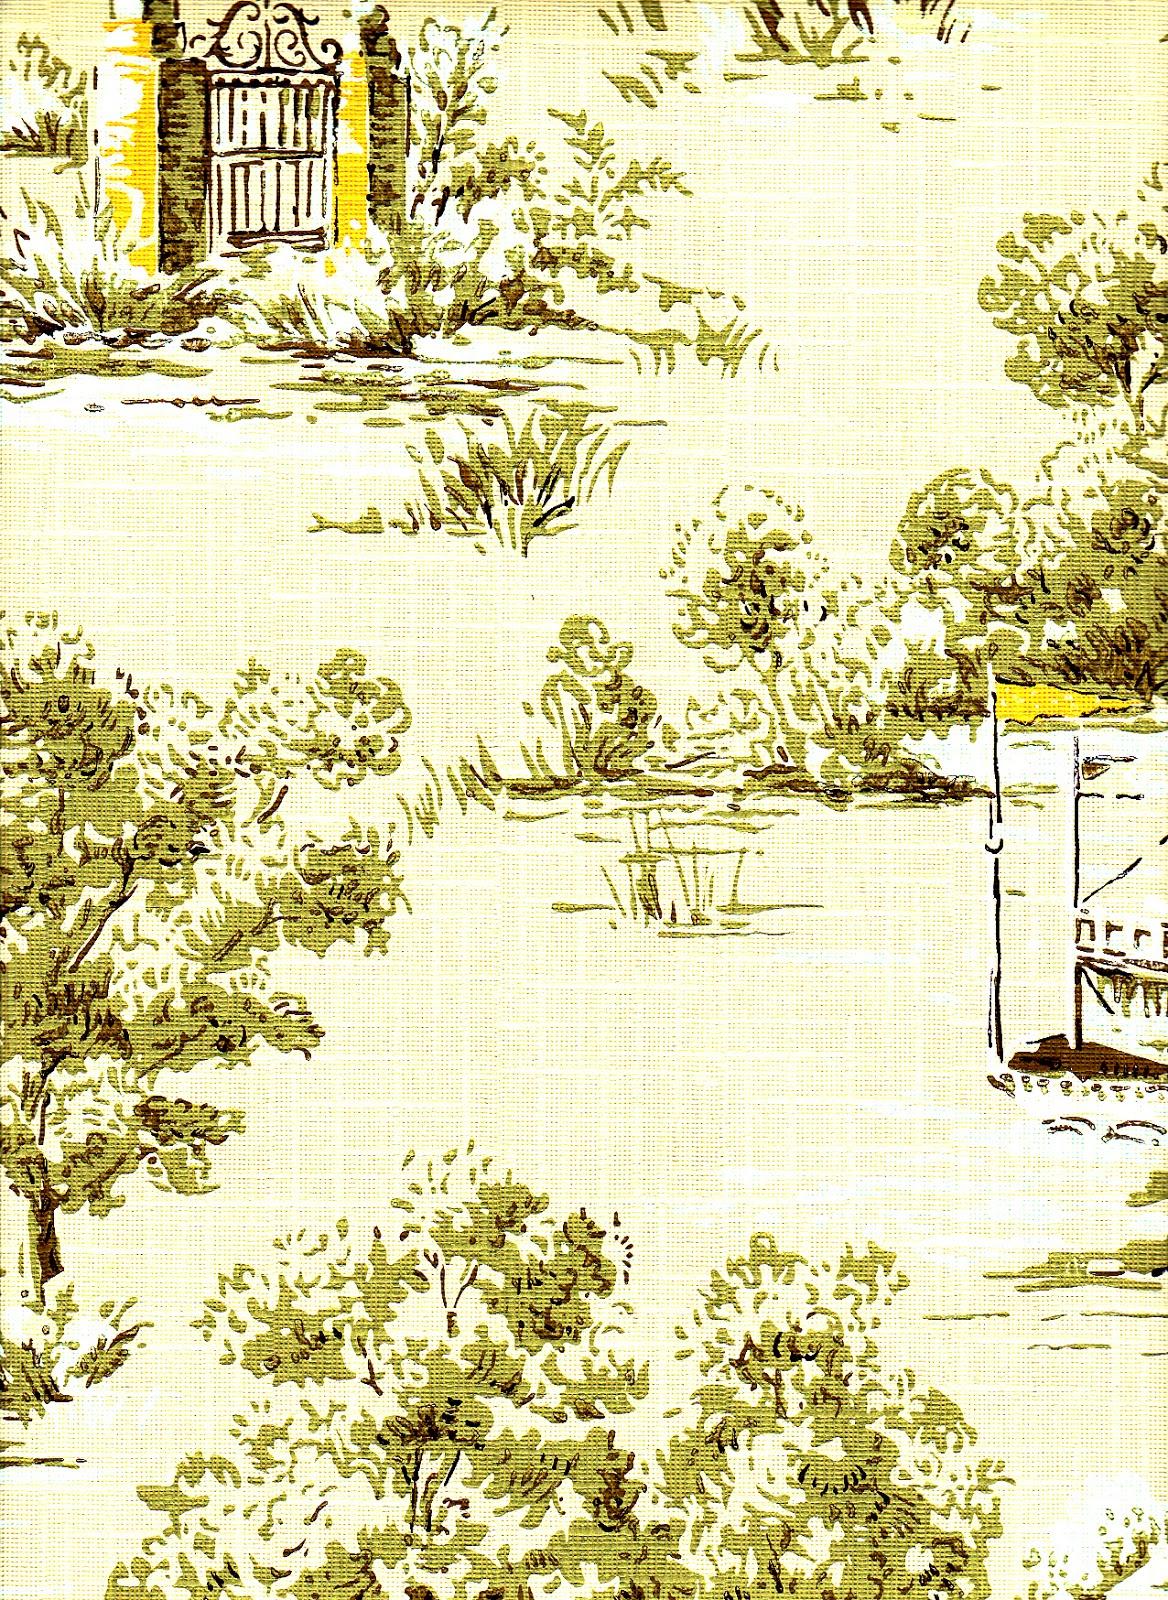 http://3.bp.blogspot.com/-NtZASCS1SXI/UTjokUtae2I/AAAAAAAAB6M/4K7txGVpOzA/s1600/more+vintage+wallpaper_0014.jpg